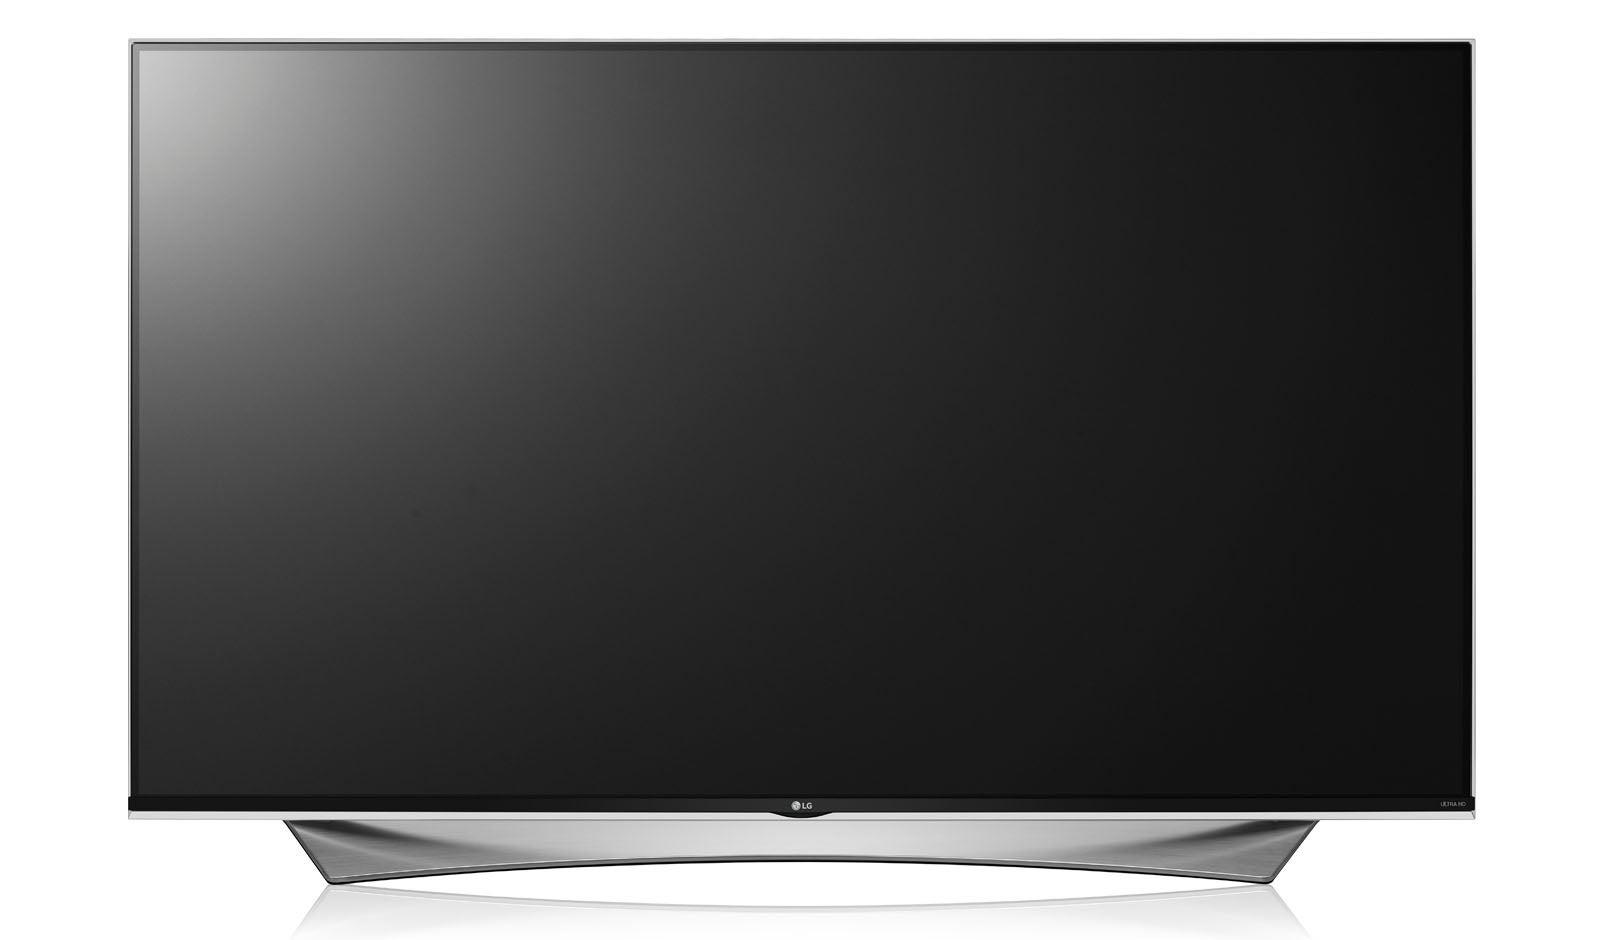 YuppTV LG TV App | Watch Live TV On LG TV With YuppTV App